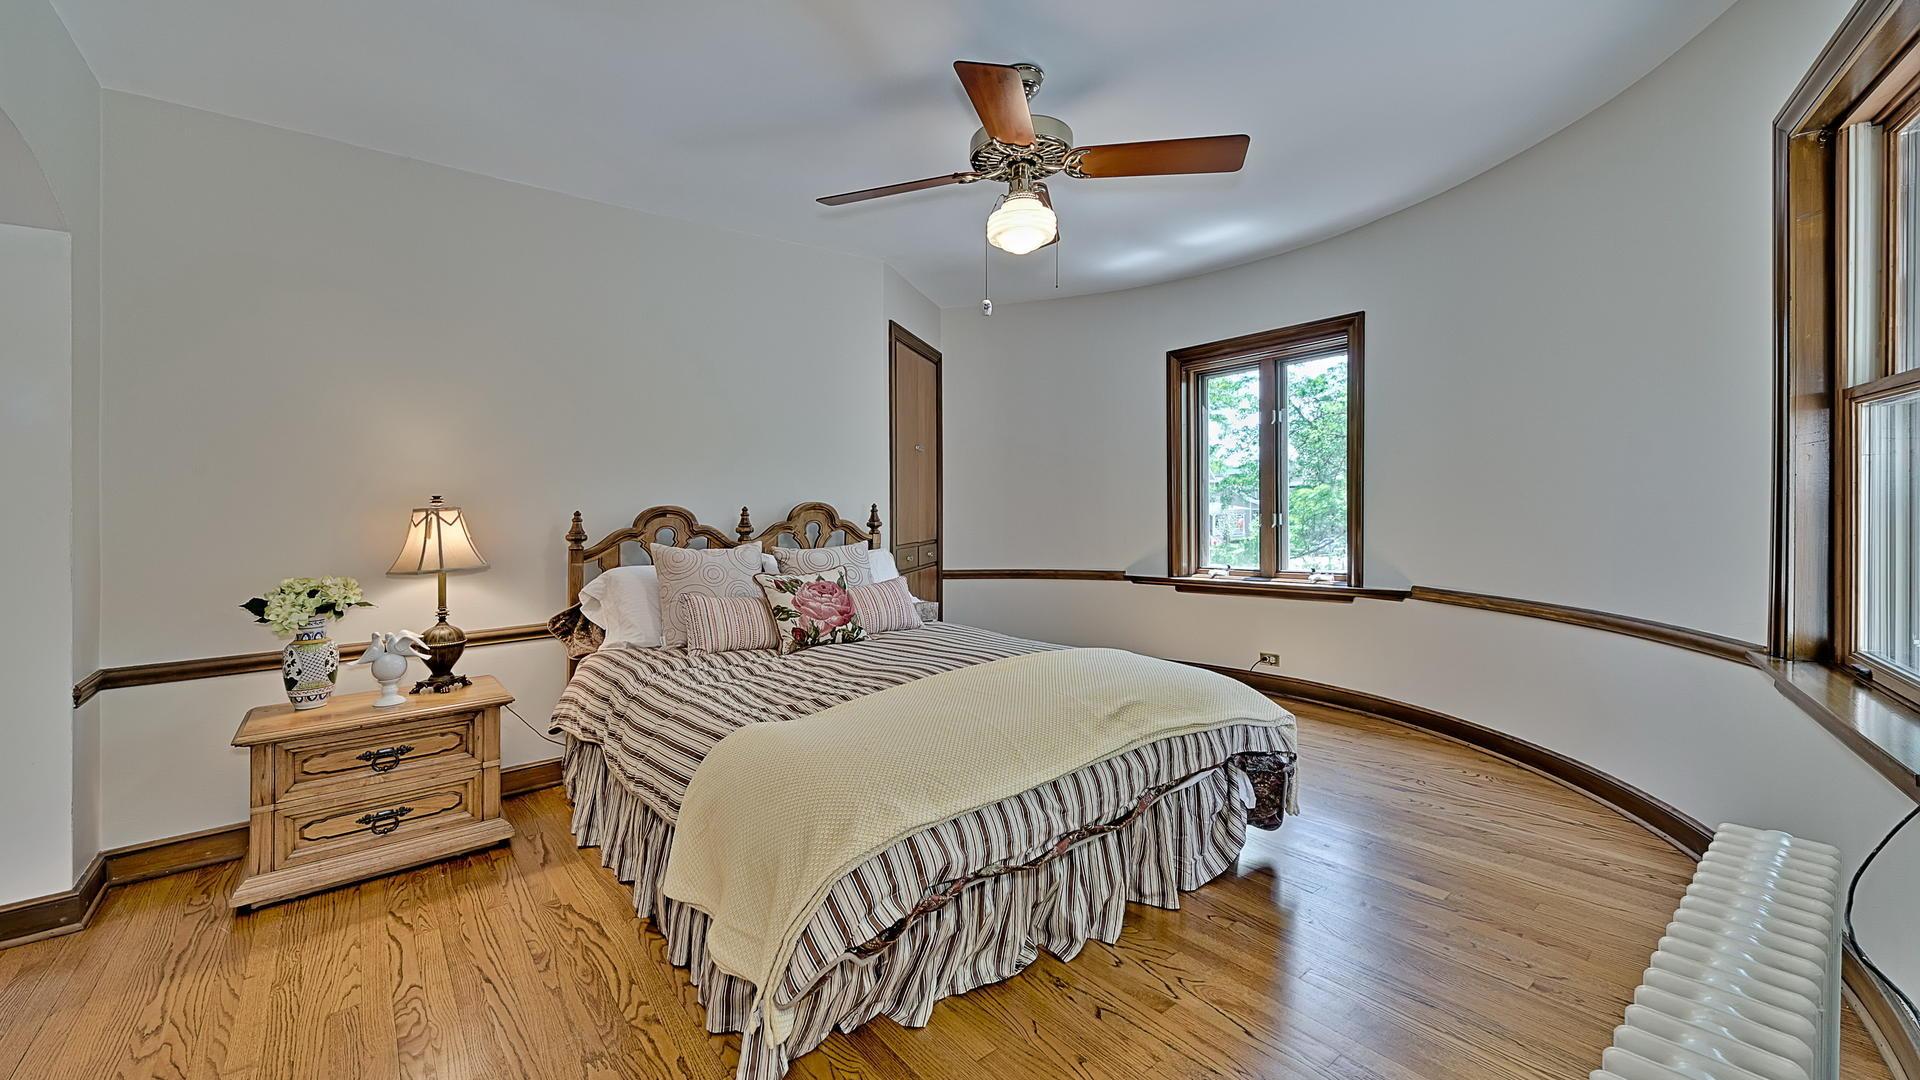 301 West Cossitt, La Grange, Illinois, 60525